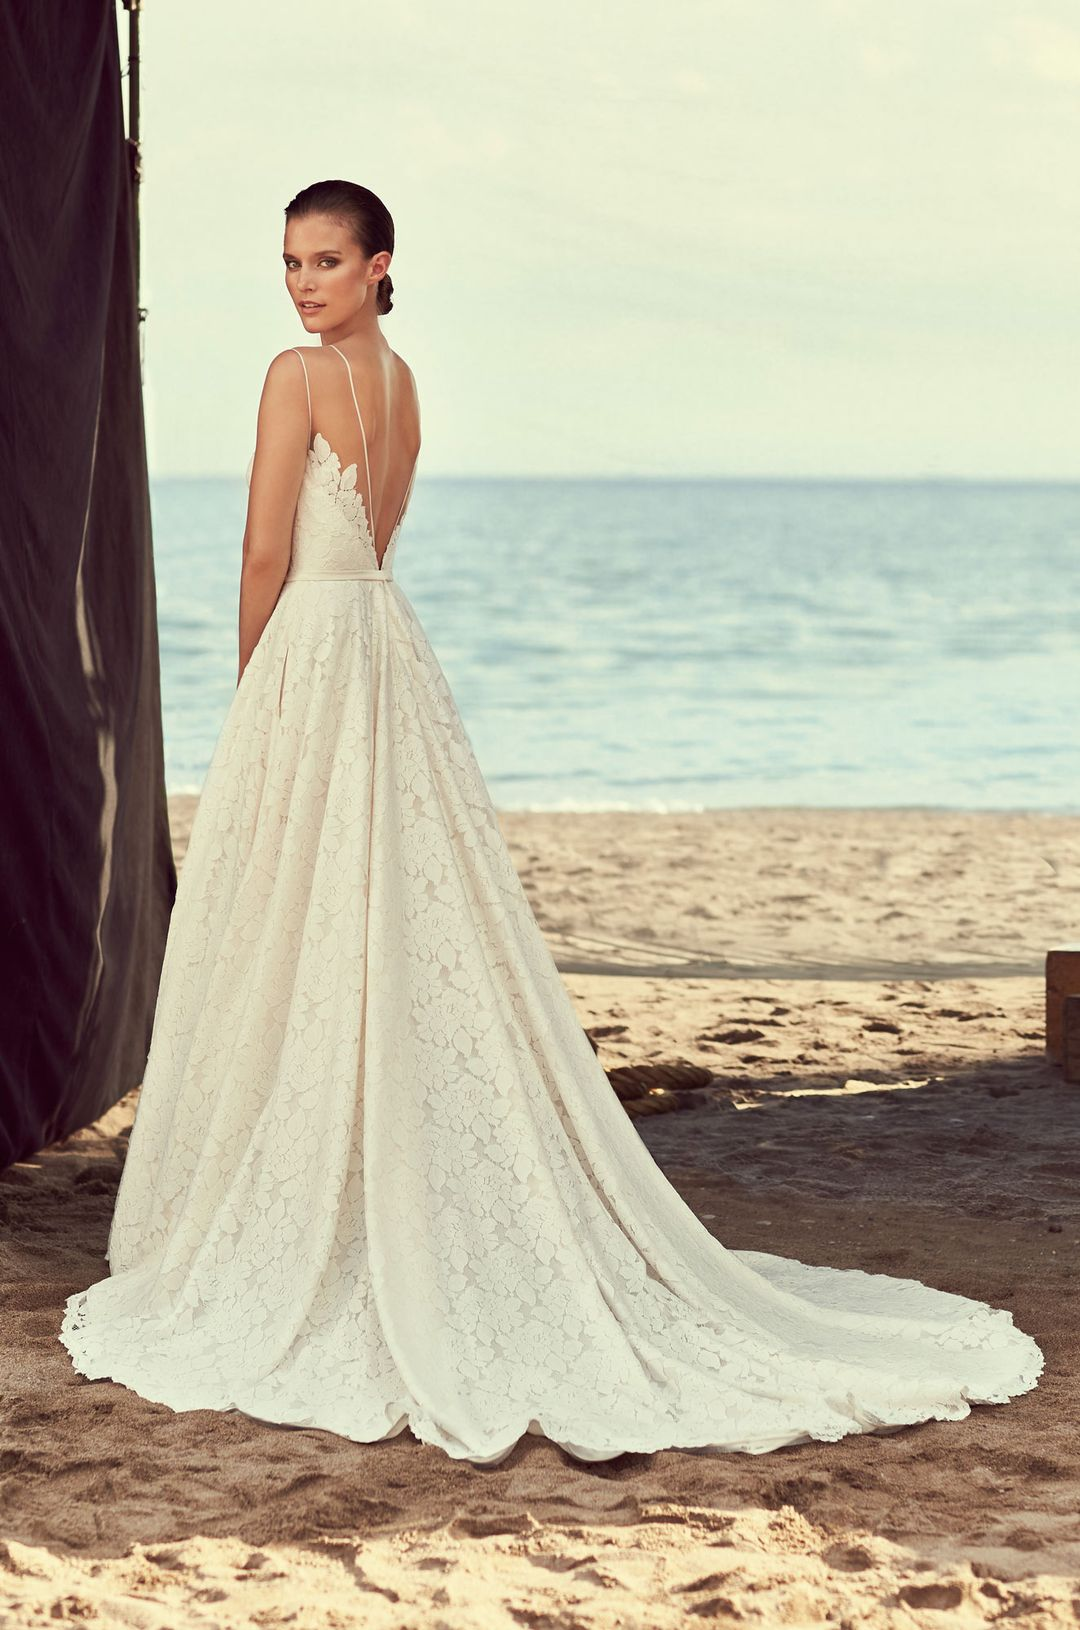 Full lace skirt wedding dress style mikaella bridal